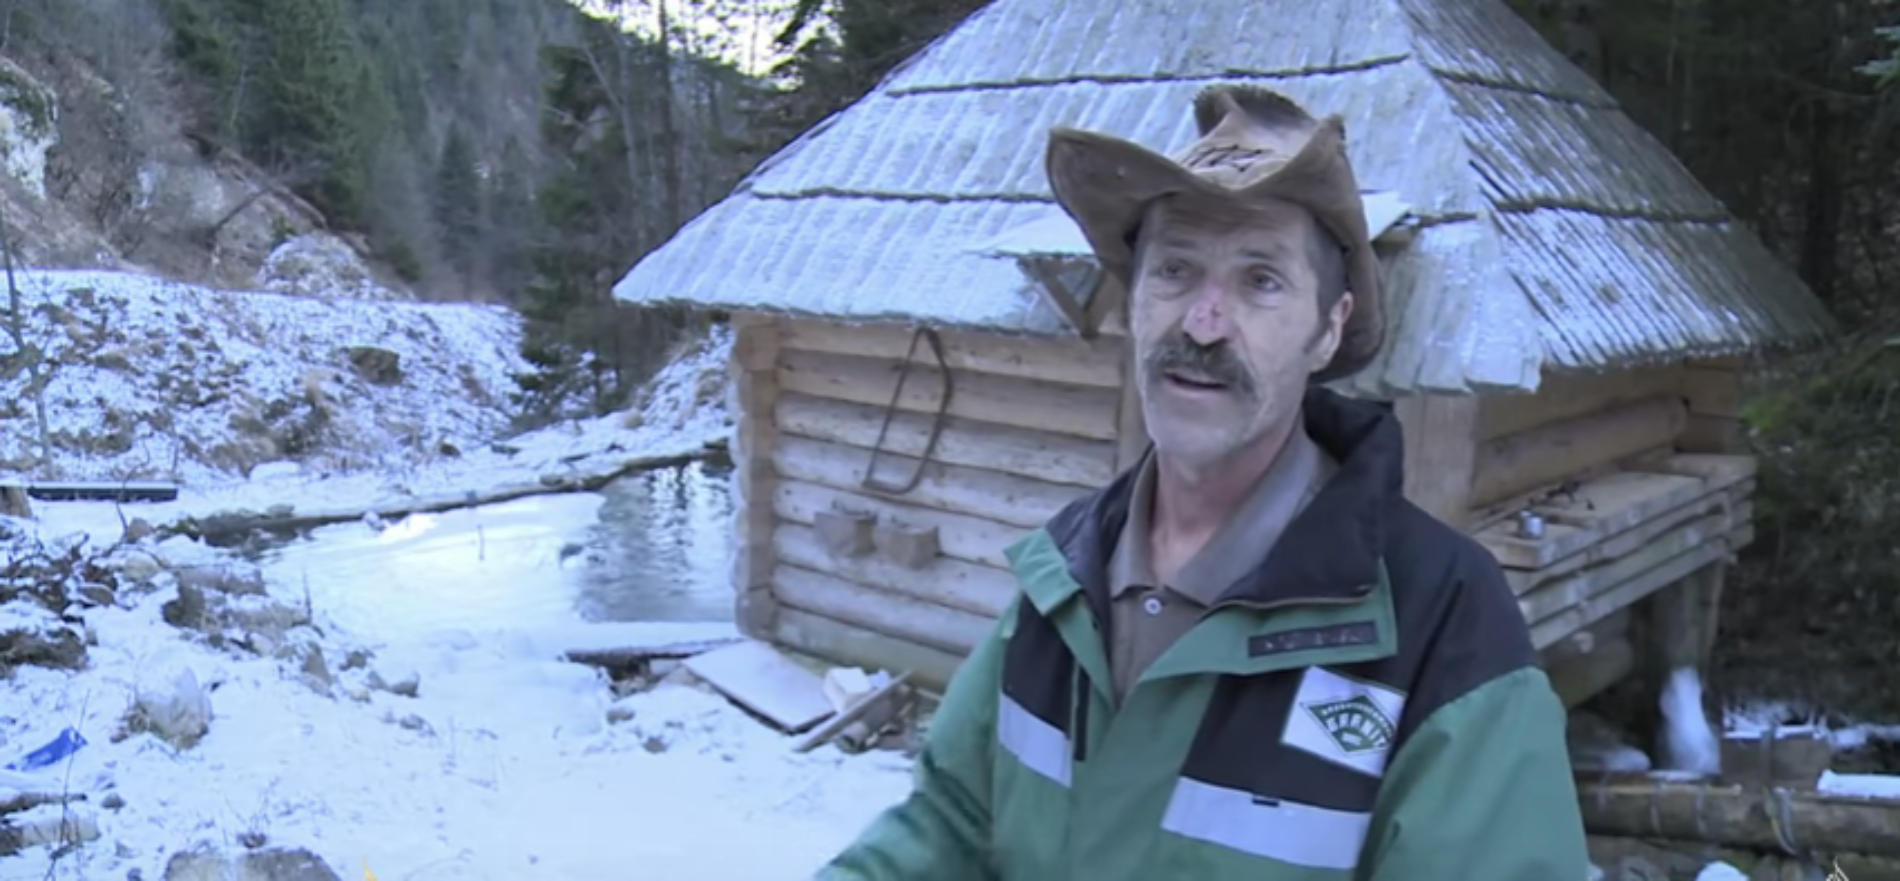 Život s prirodom: 'Vlašićki Robinzon' ne razmišlja o povratku u grad (Video)